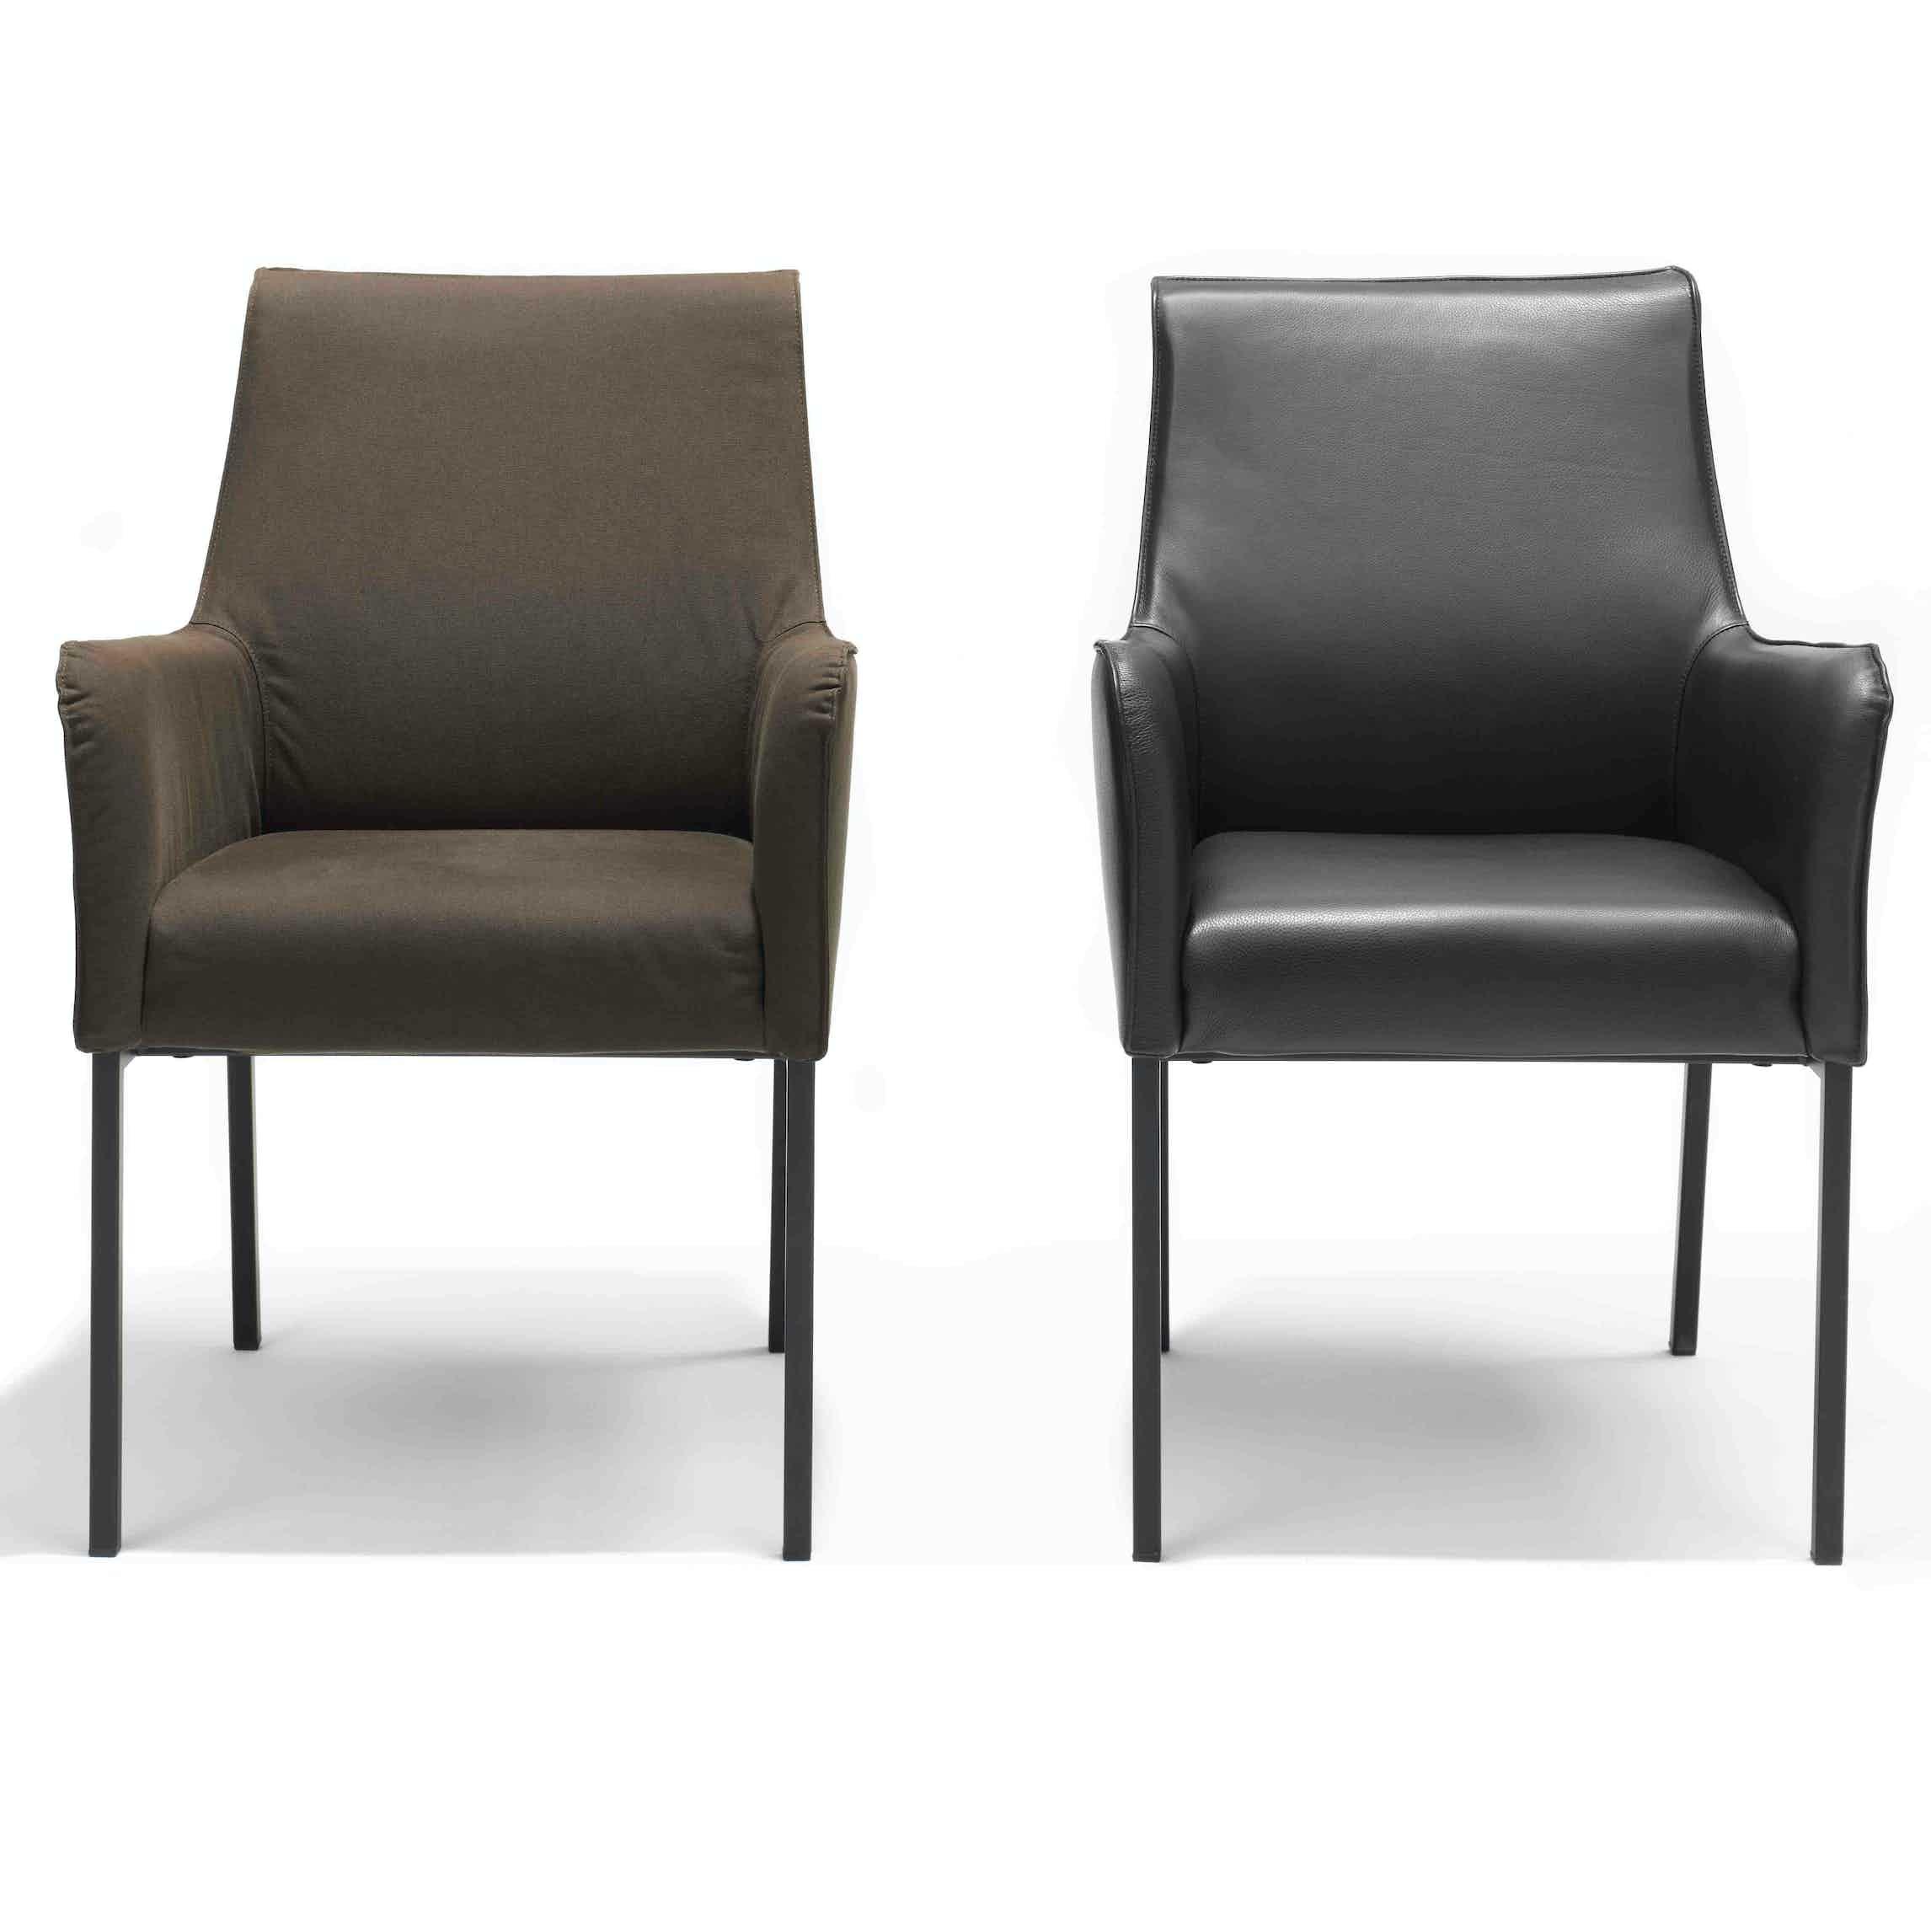 Linteloo-leather-fabric-guilietta-chair-haute-living